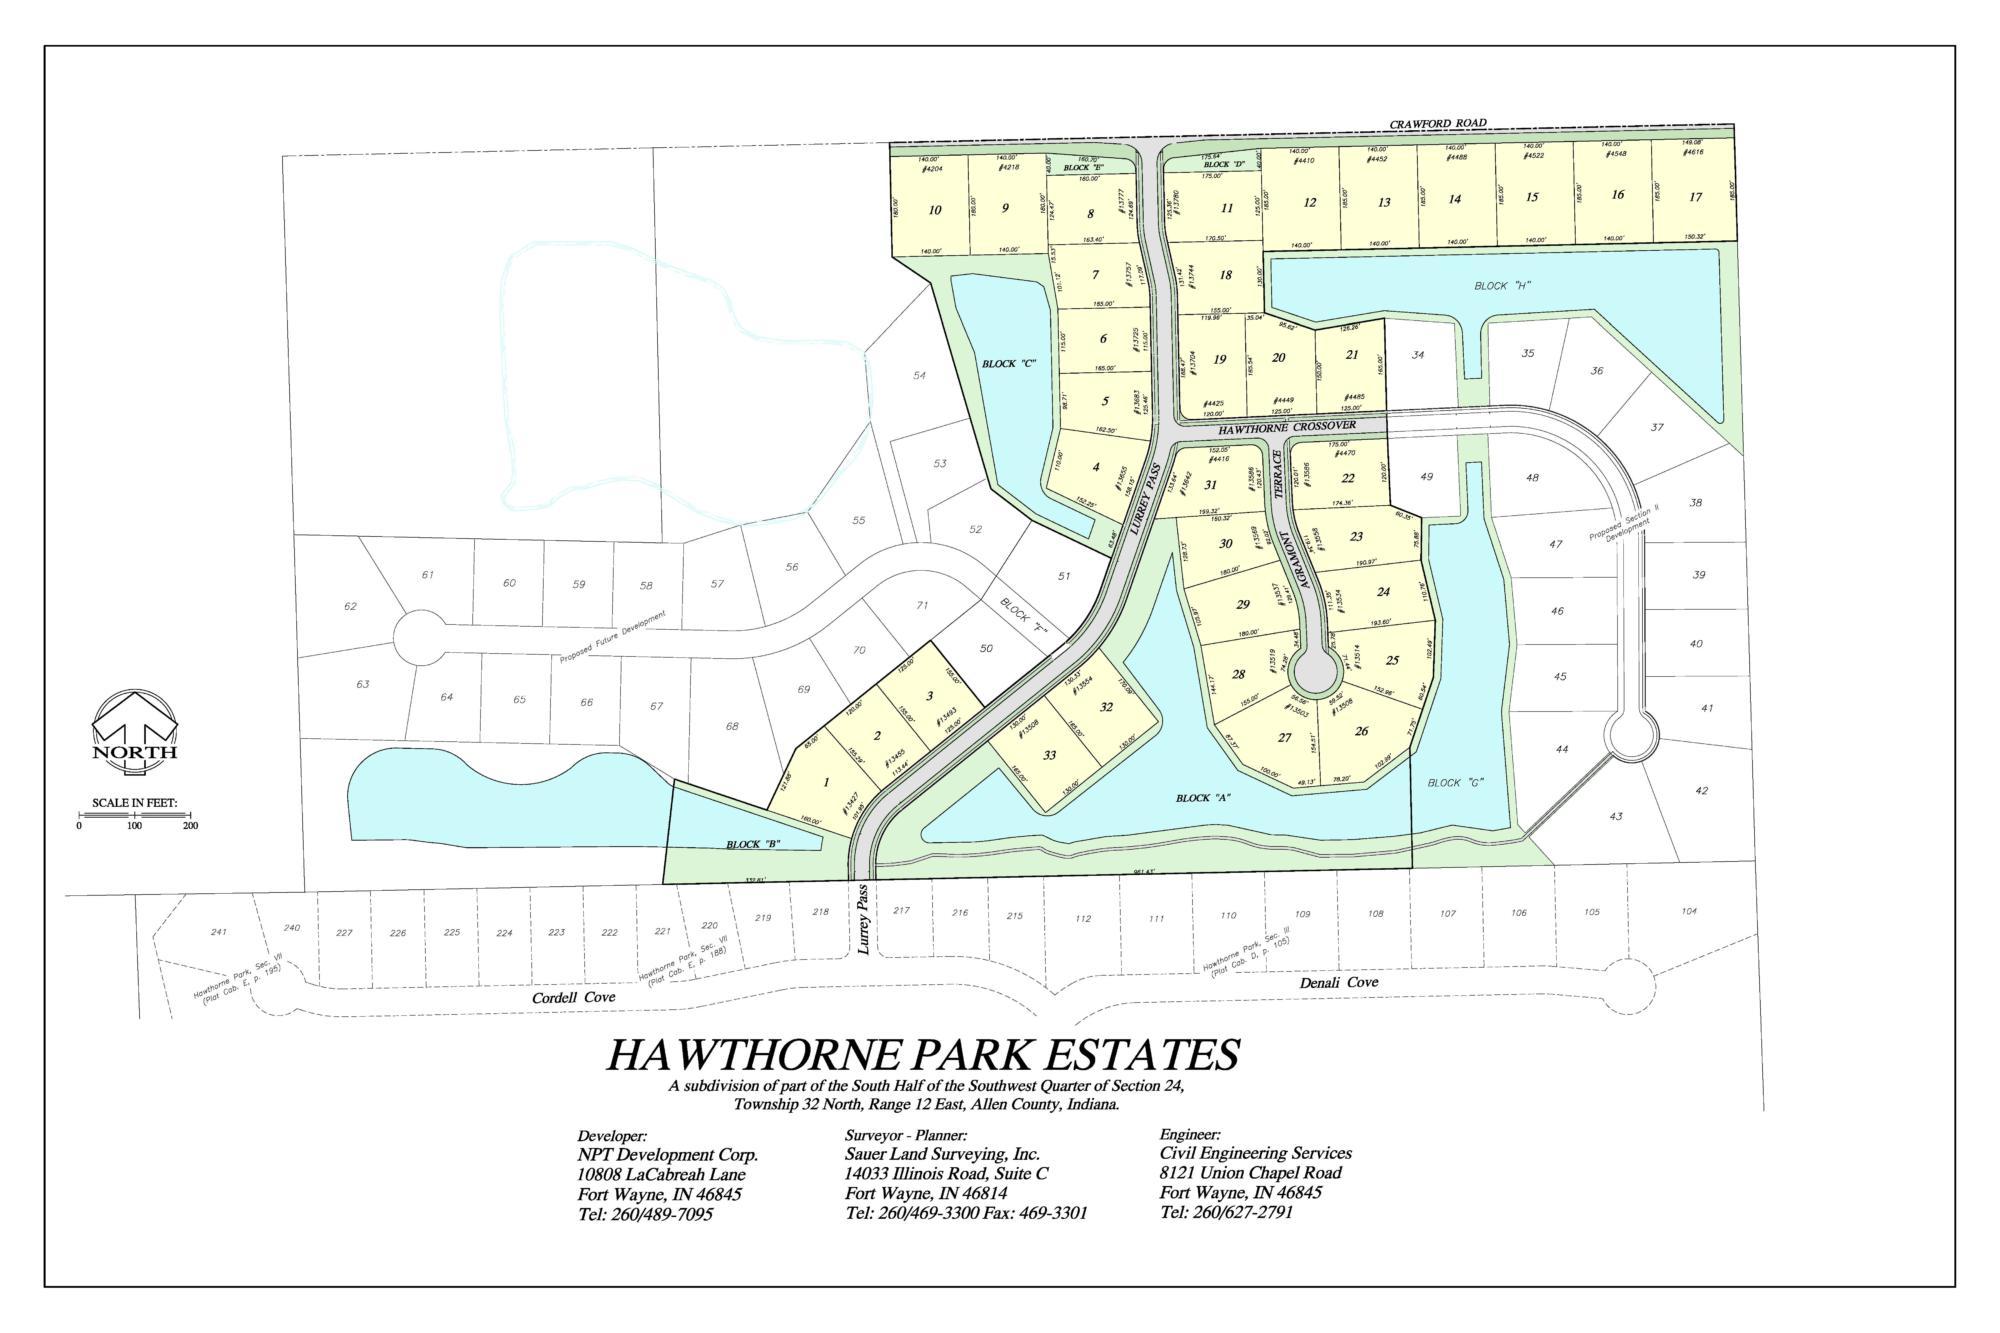 Hawthorne Park Estates